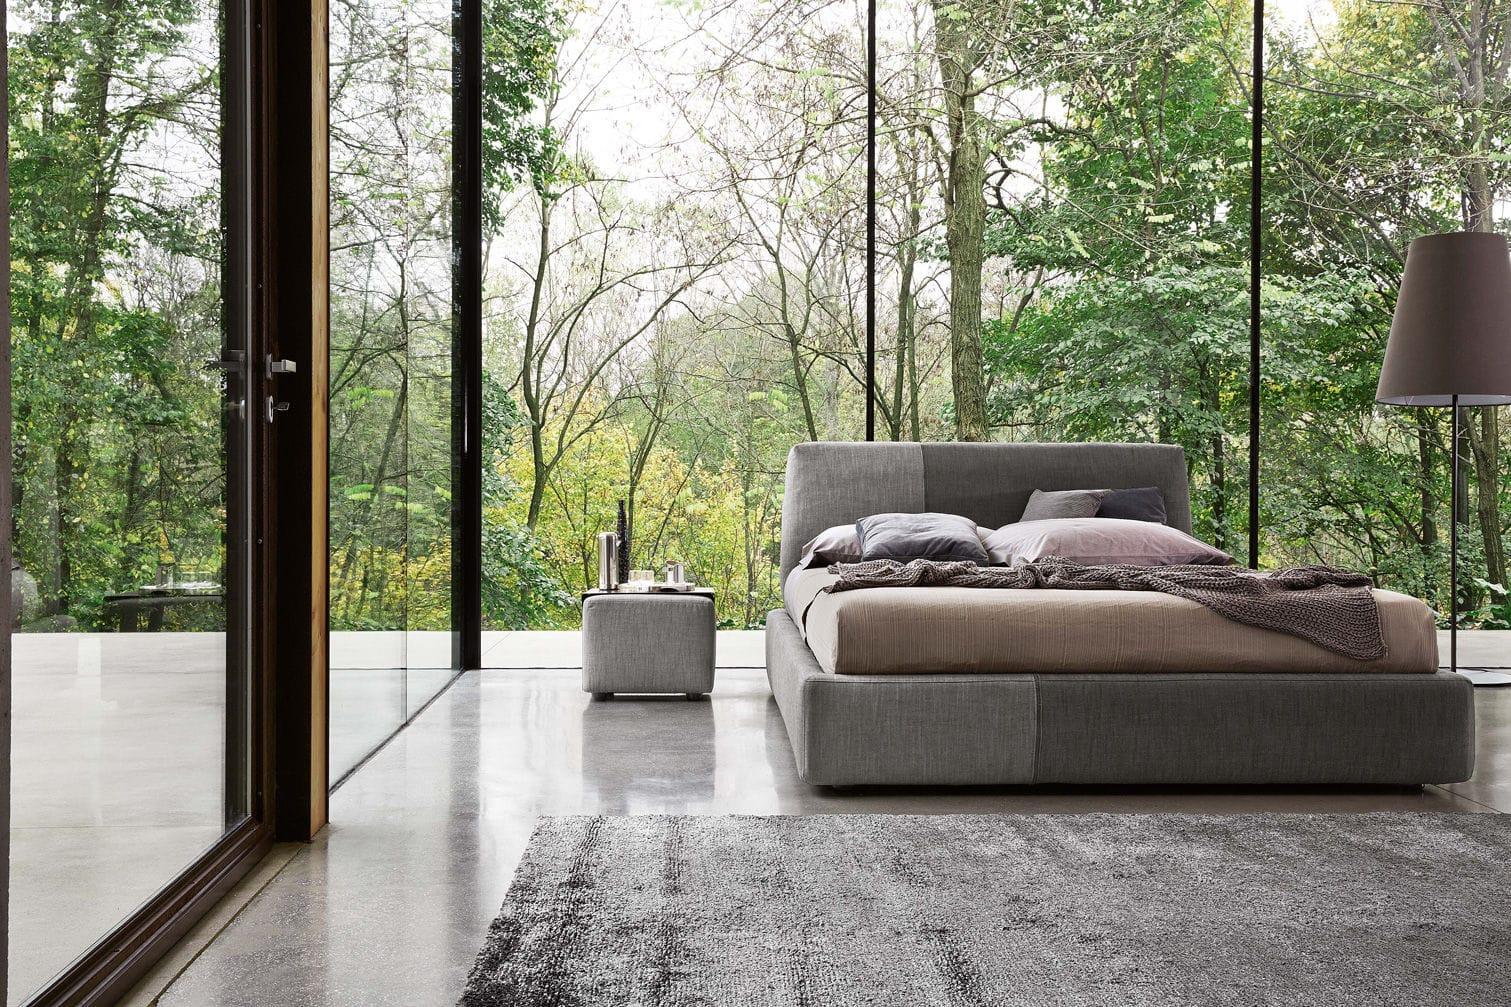 Standardbett / Doppelt / Modern / Stoff SANDERS By Spessotto U0026 Agnoletto Ditre  Italia